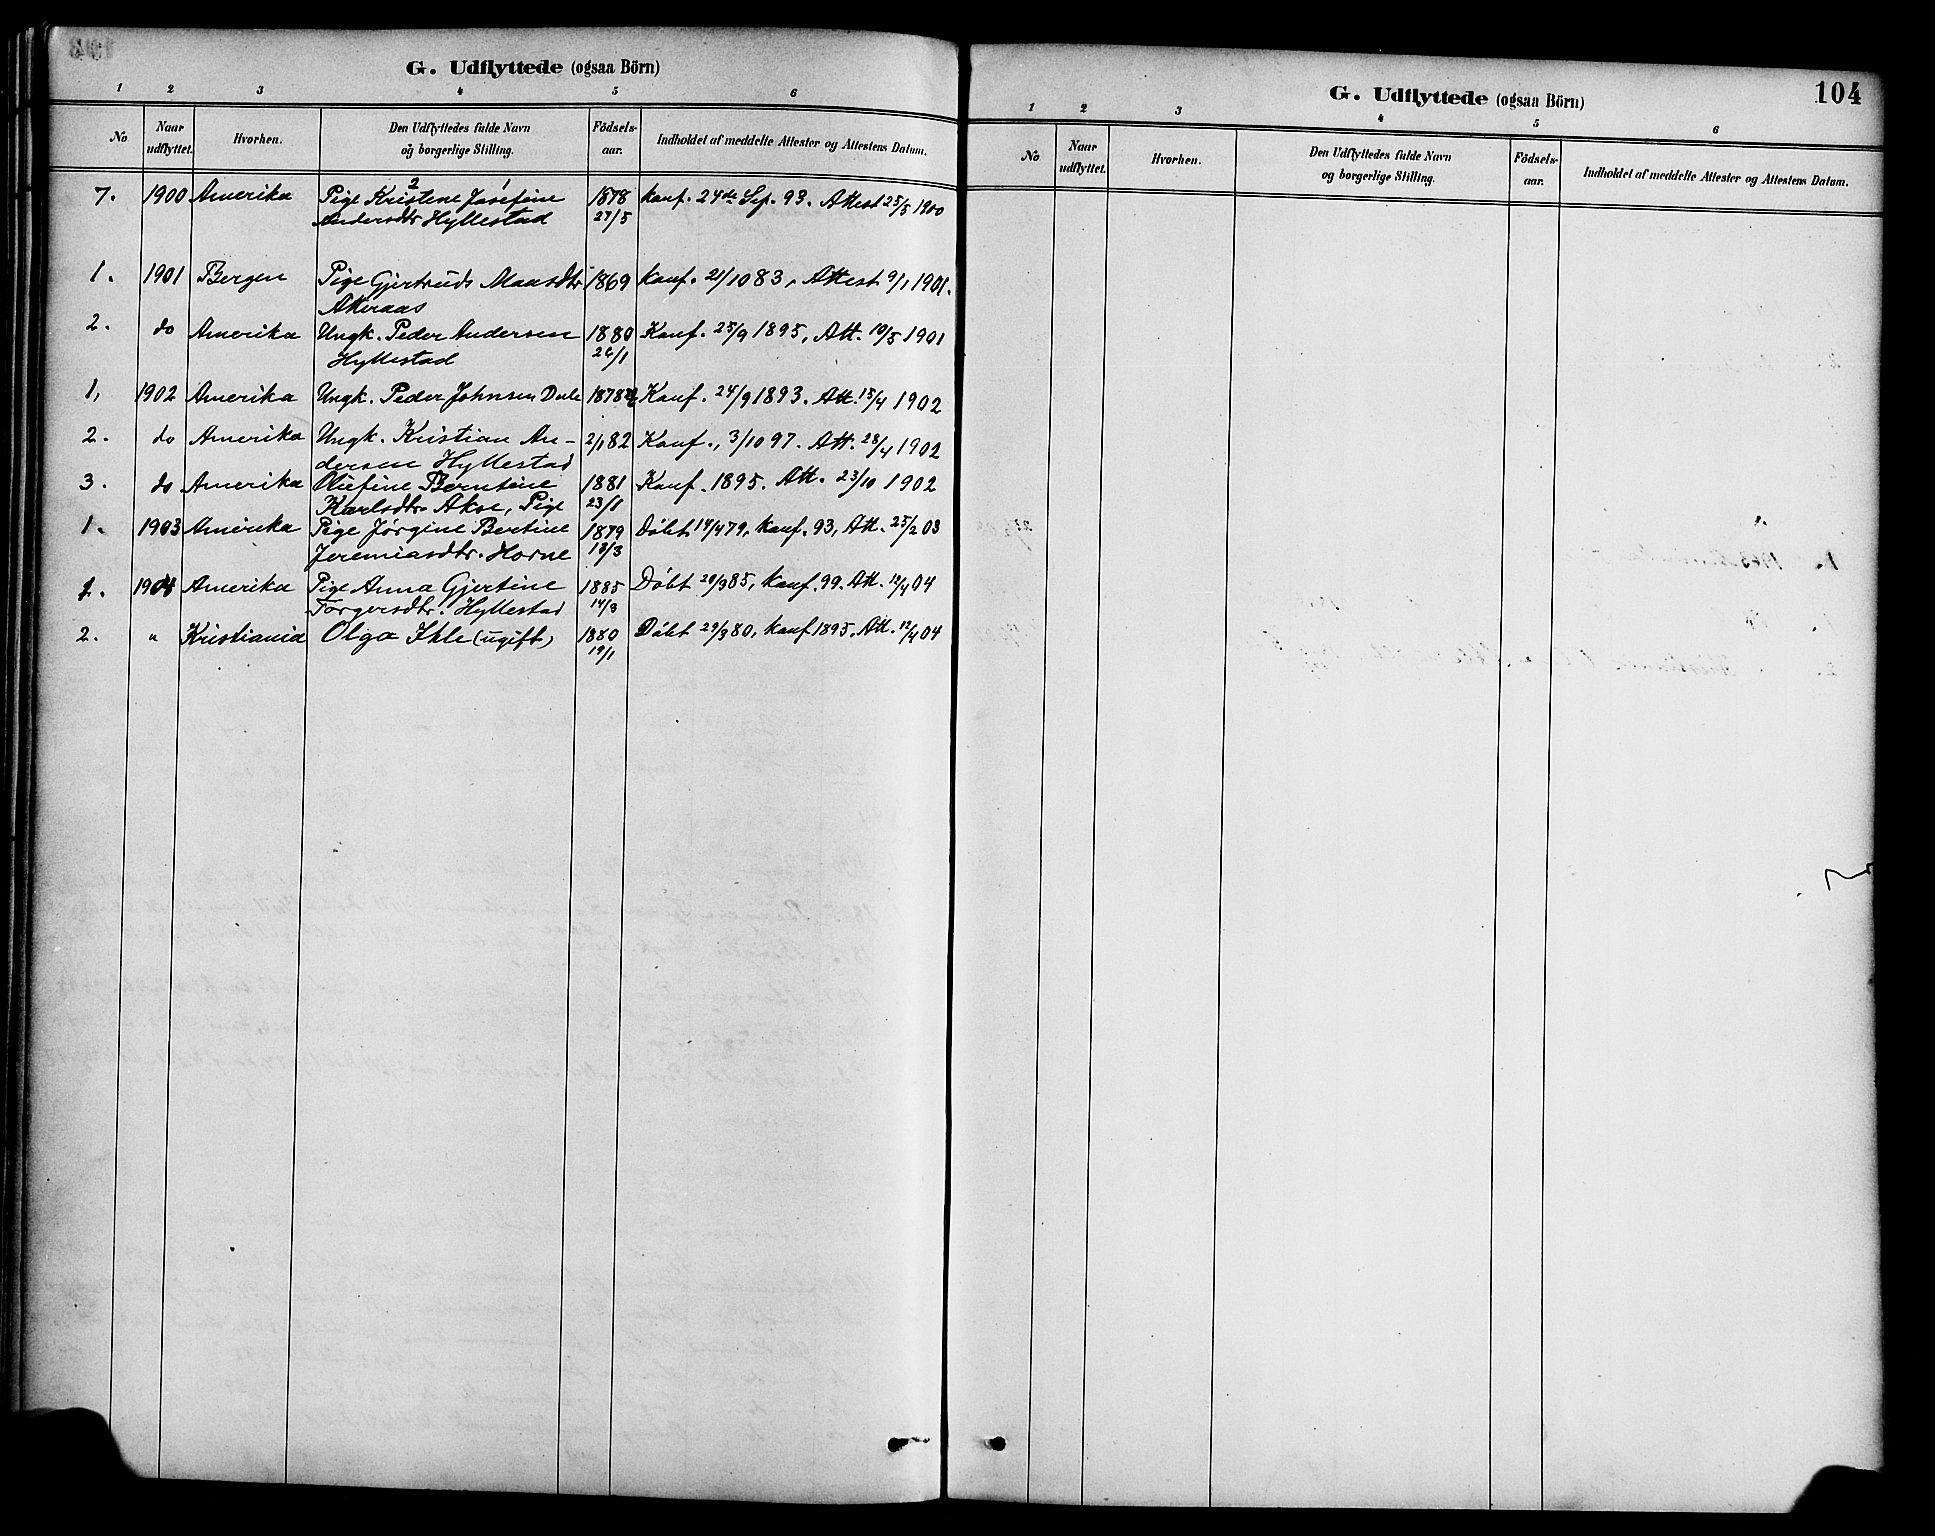 SAB, Hyllestad sokneprestembete, Ministerialbok nr. B 1, 1886-1904, s. 104